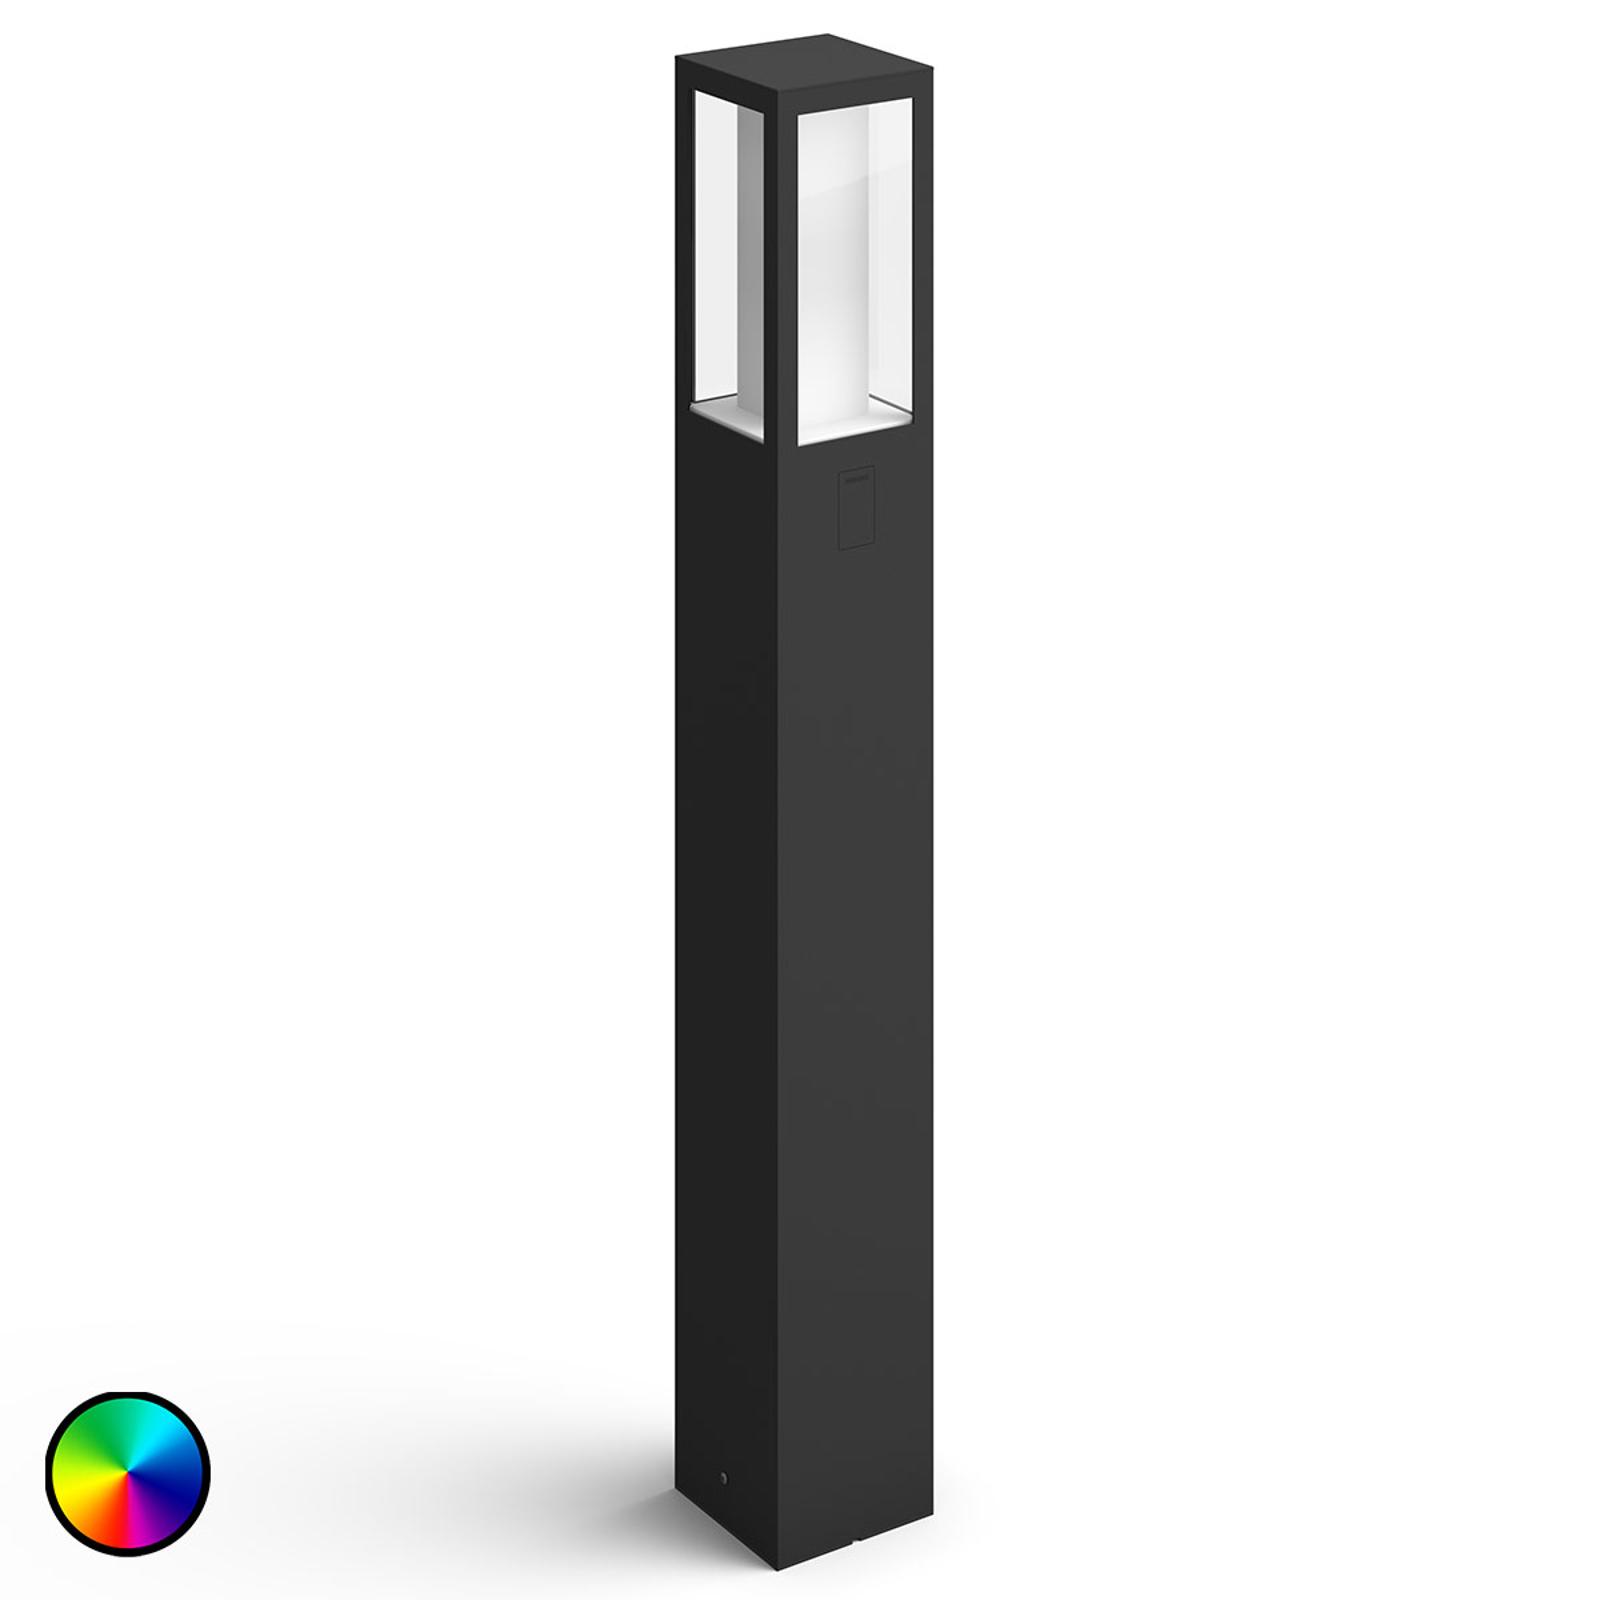 Philips Hue White+Color Impress LED-pylväsvalaisin